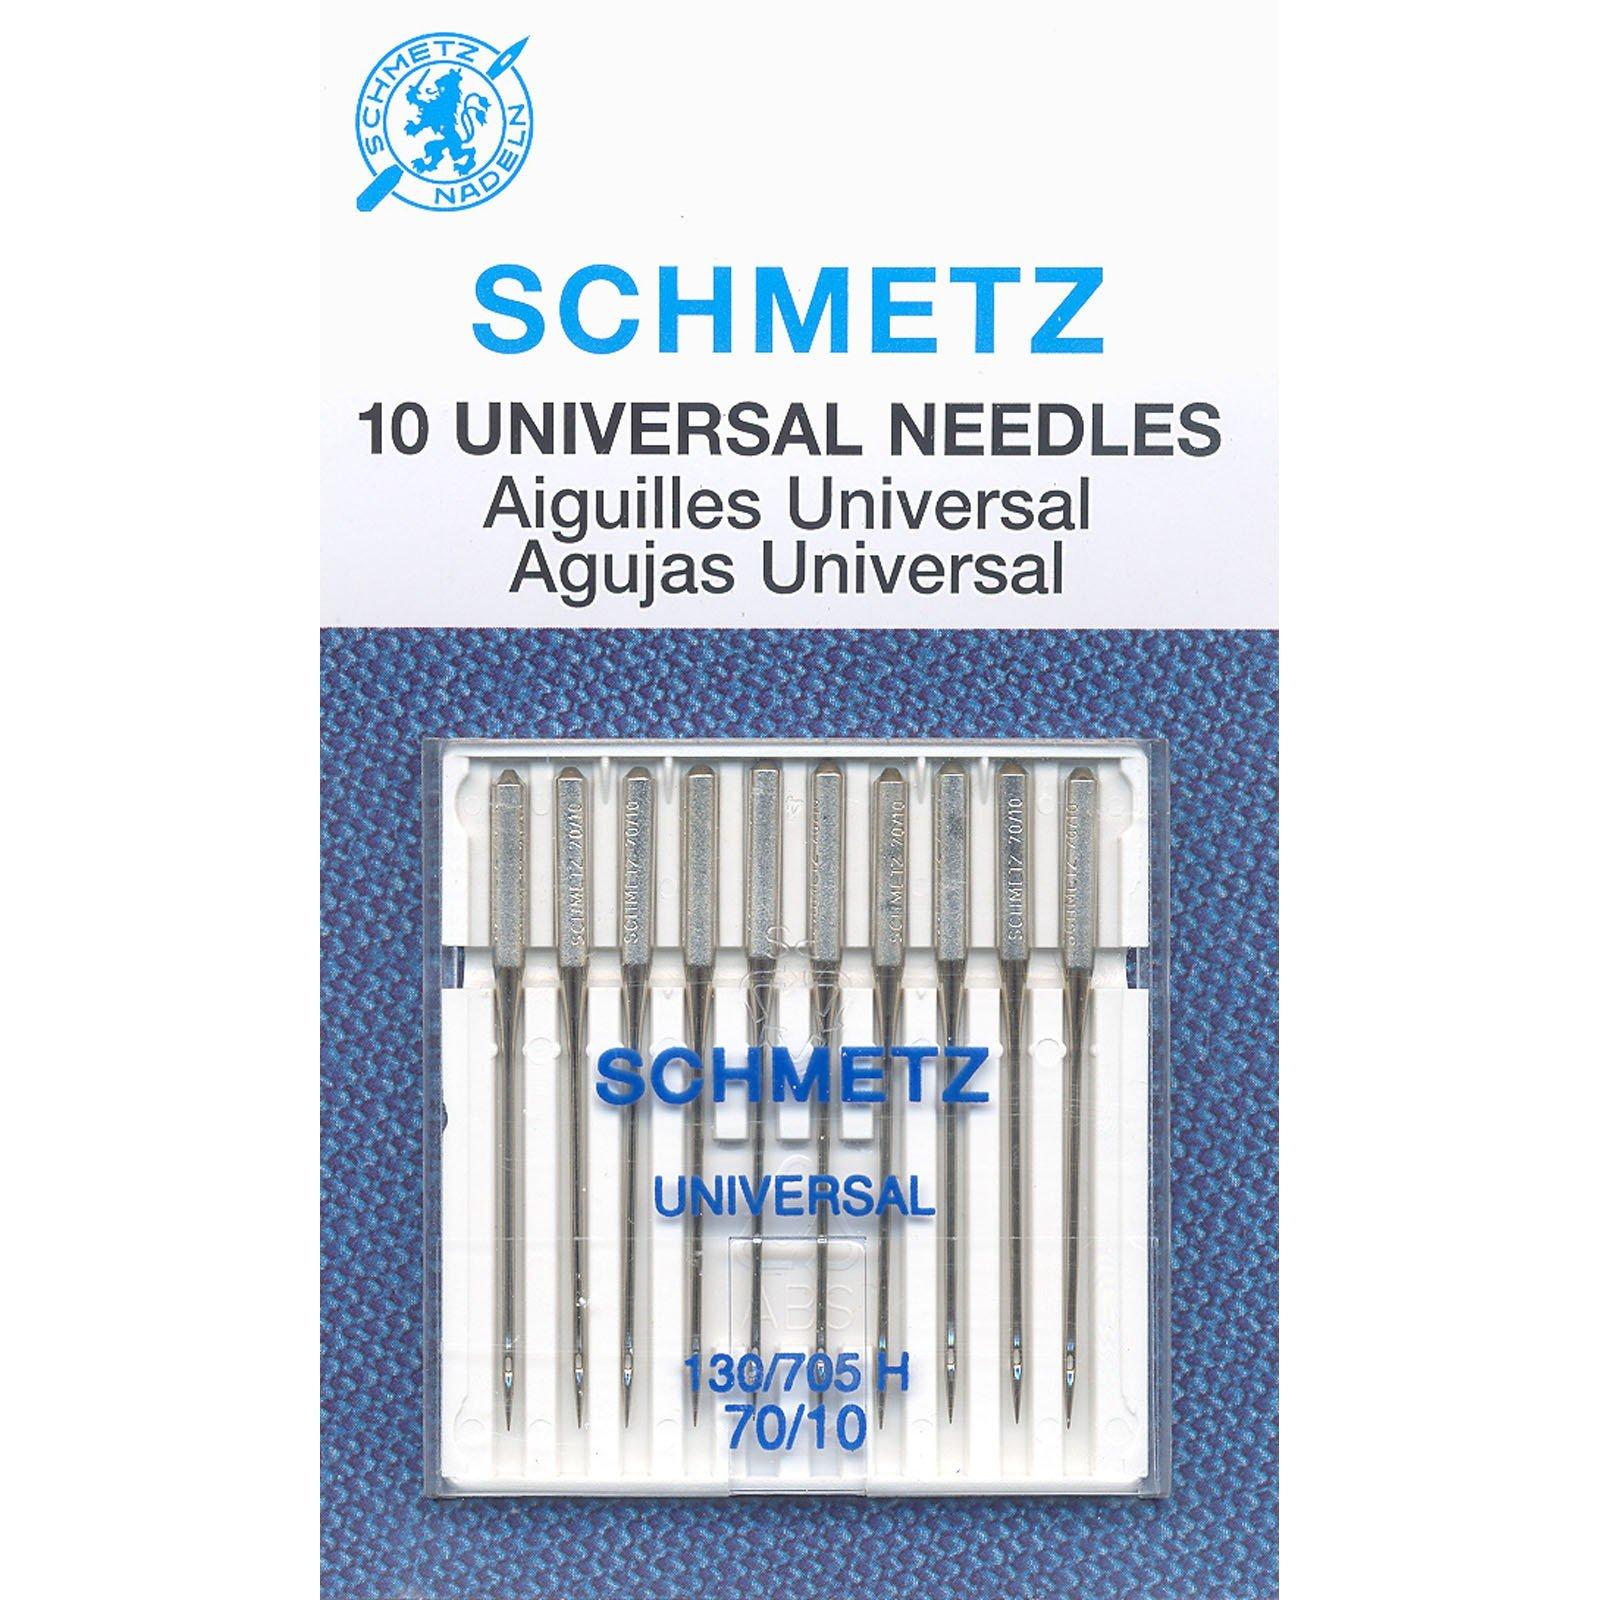 Schmetz Universal Needles 10/70